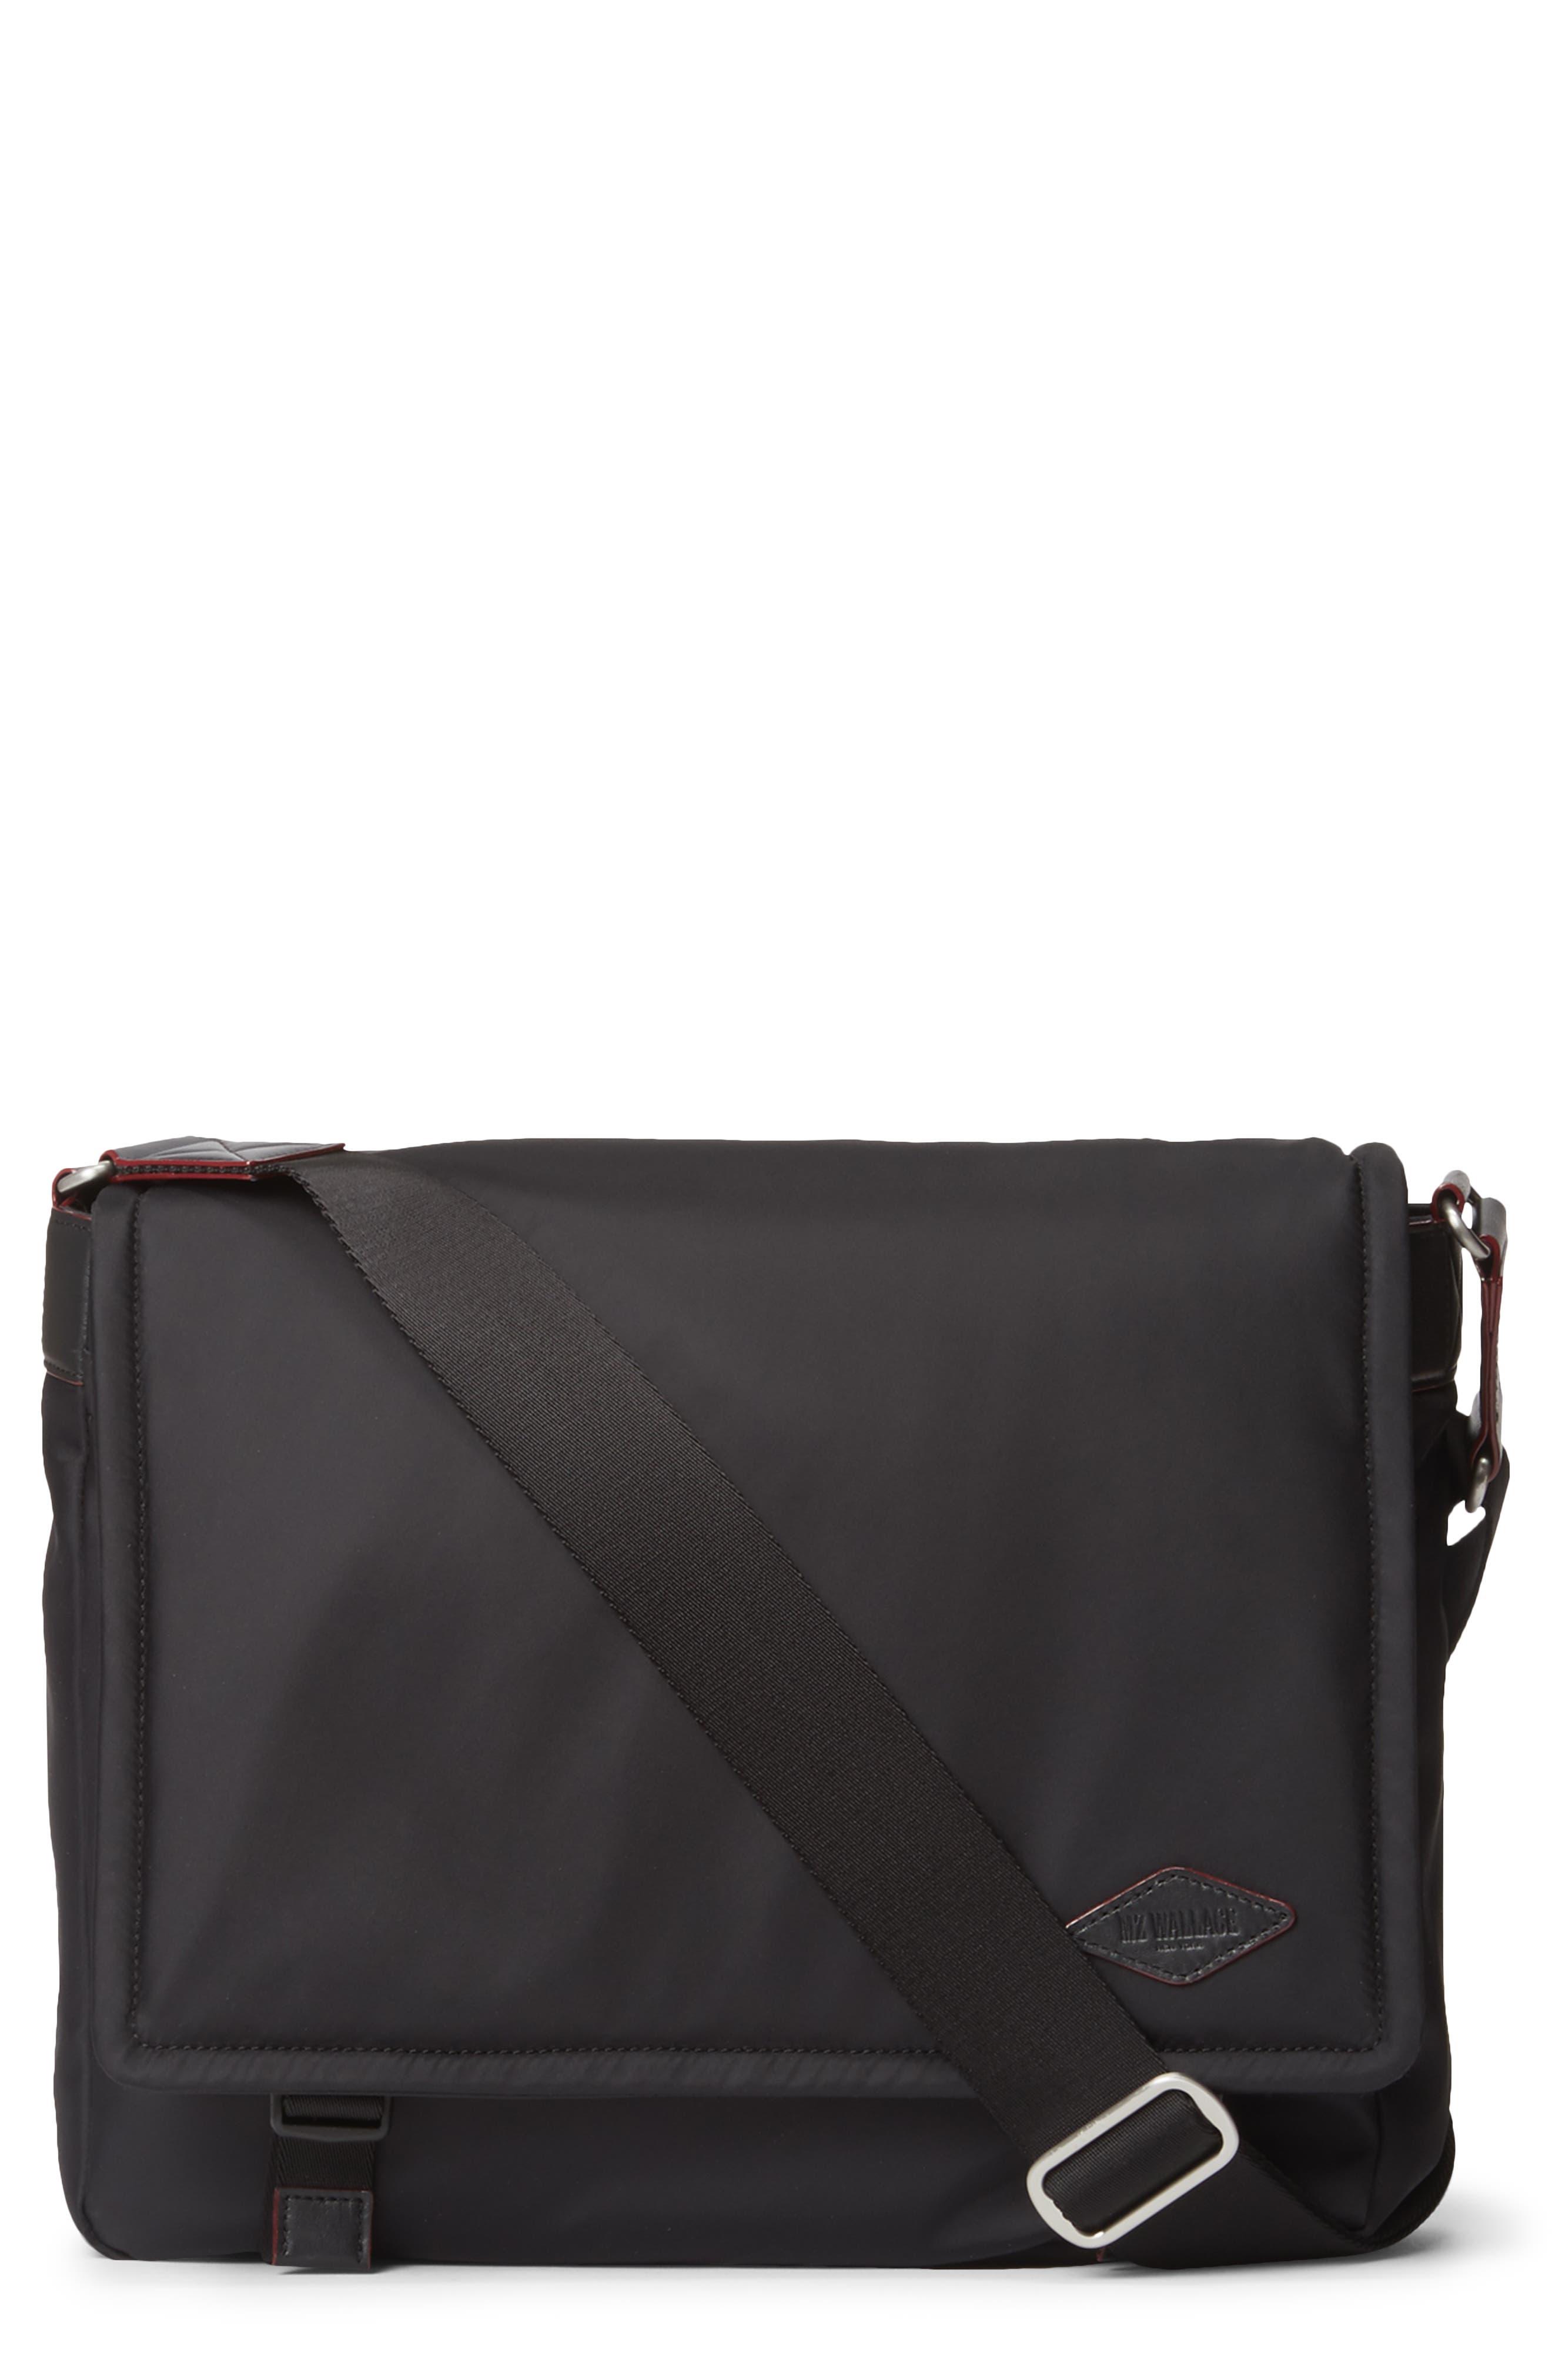 Mz Wallace Bleecker Nylon Messenger Bag - Black